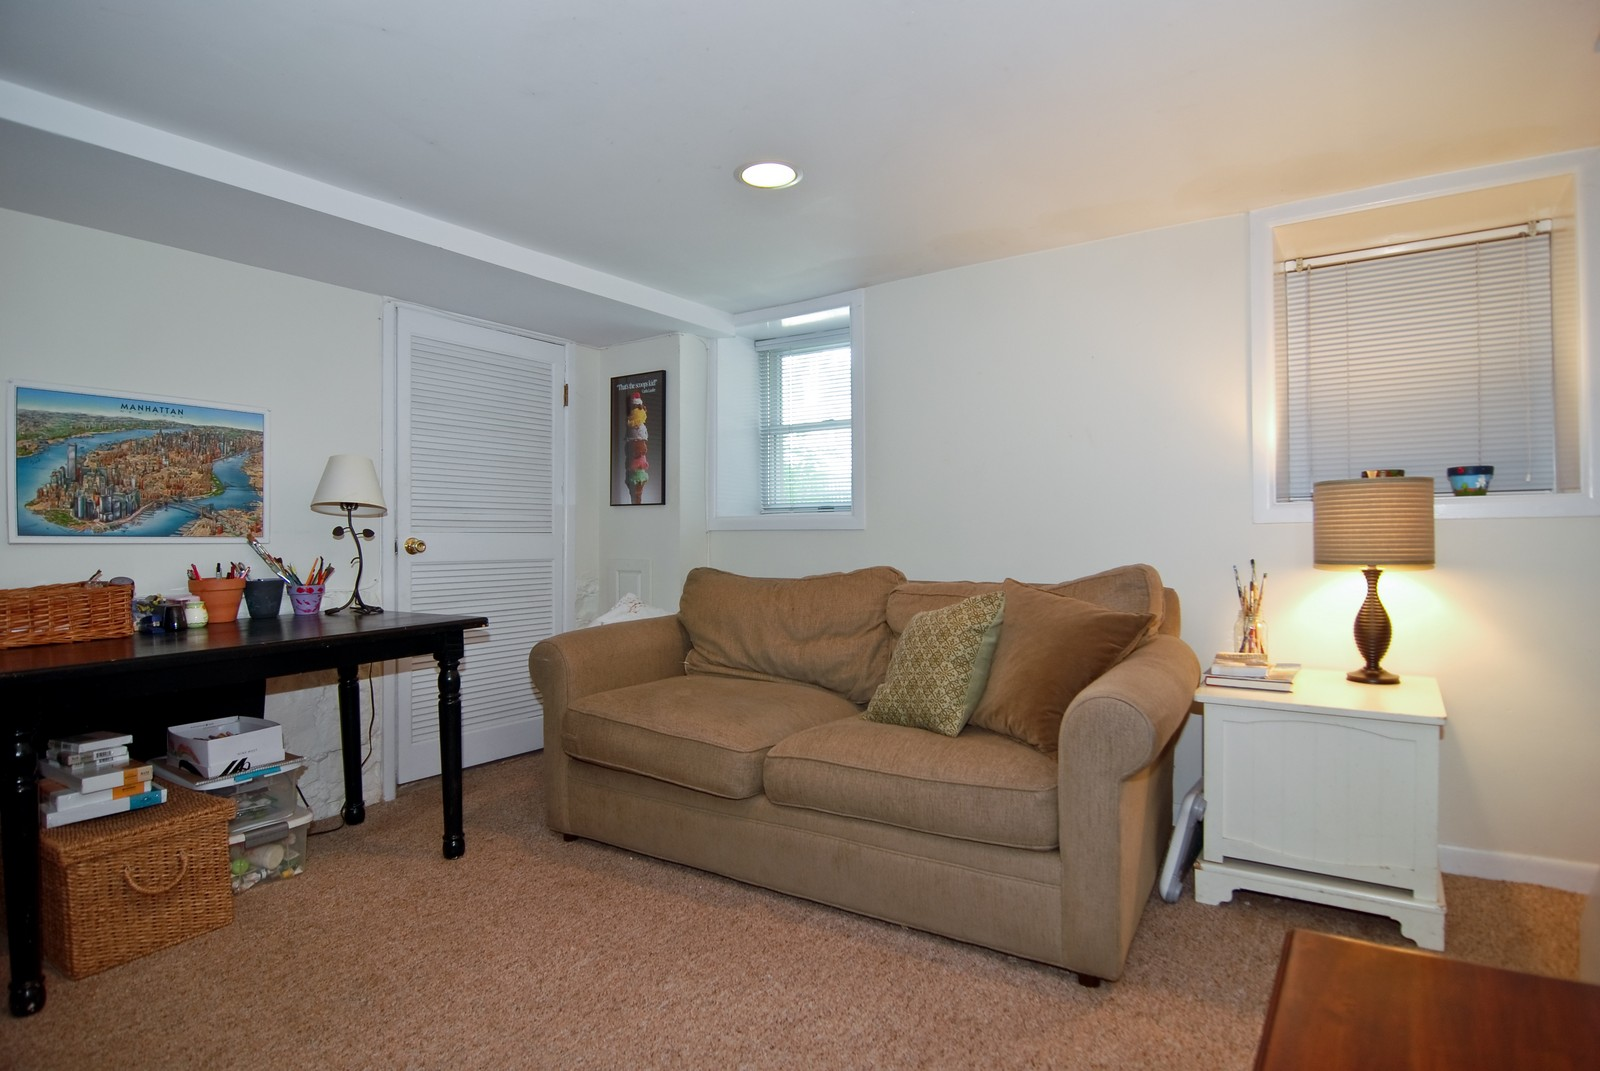 Real Estate Photography - 343 W Menomonee, Chicago, IL, 60614 - Storage